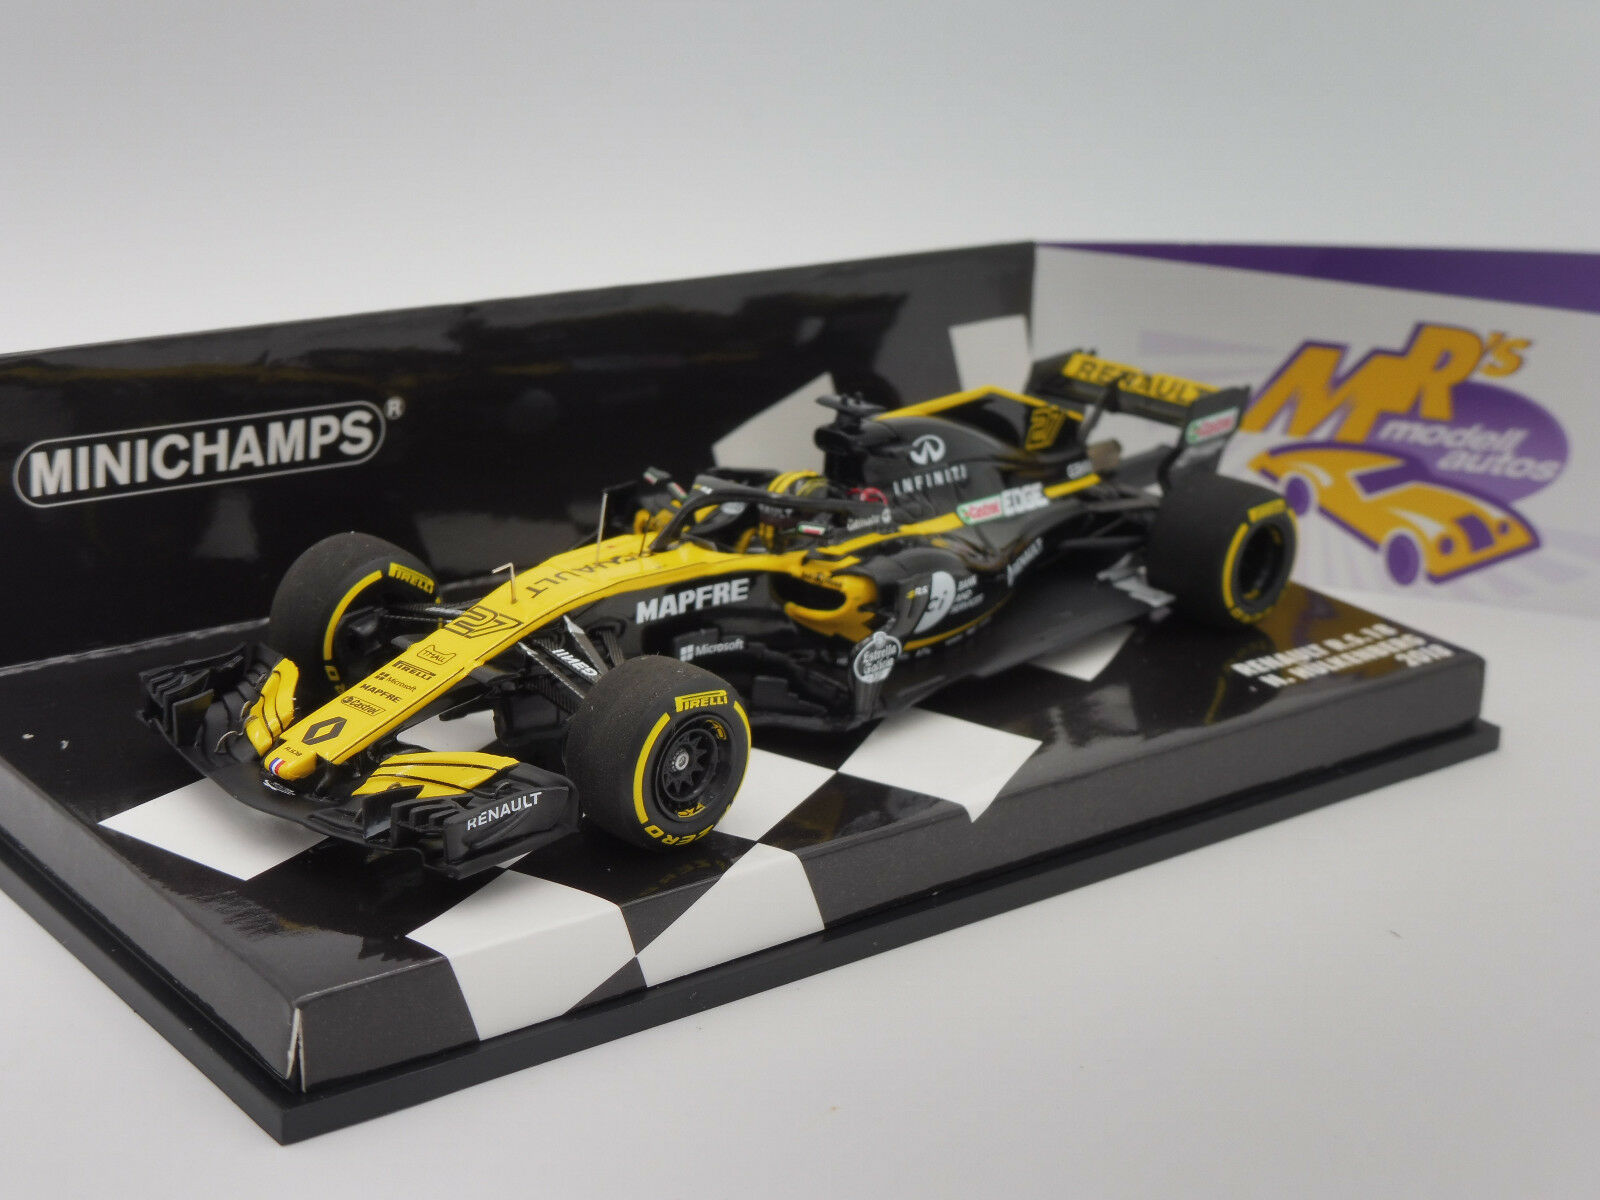 Minichamps 417180027-Renault Sport r.s.18 fórmula 1 2018  n. Hülkenberg  1 43